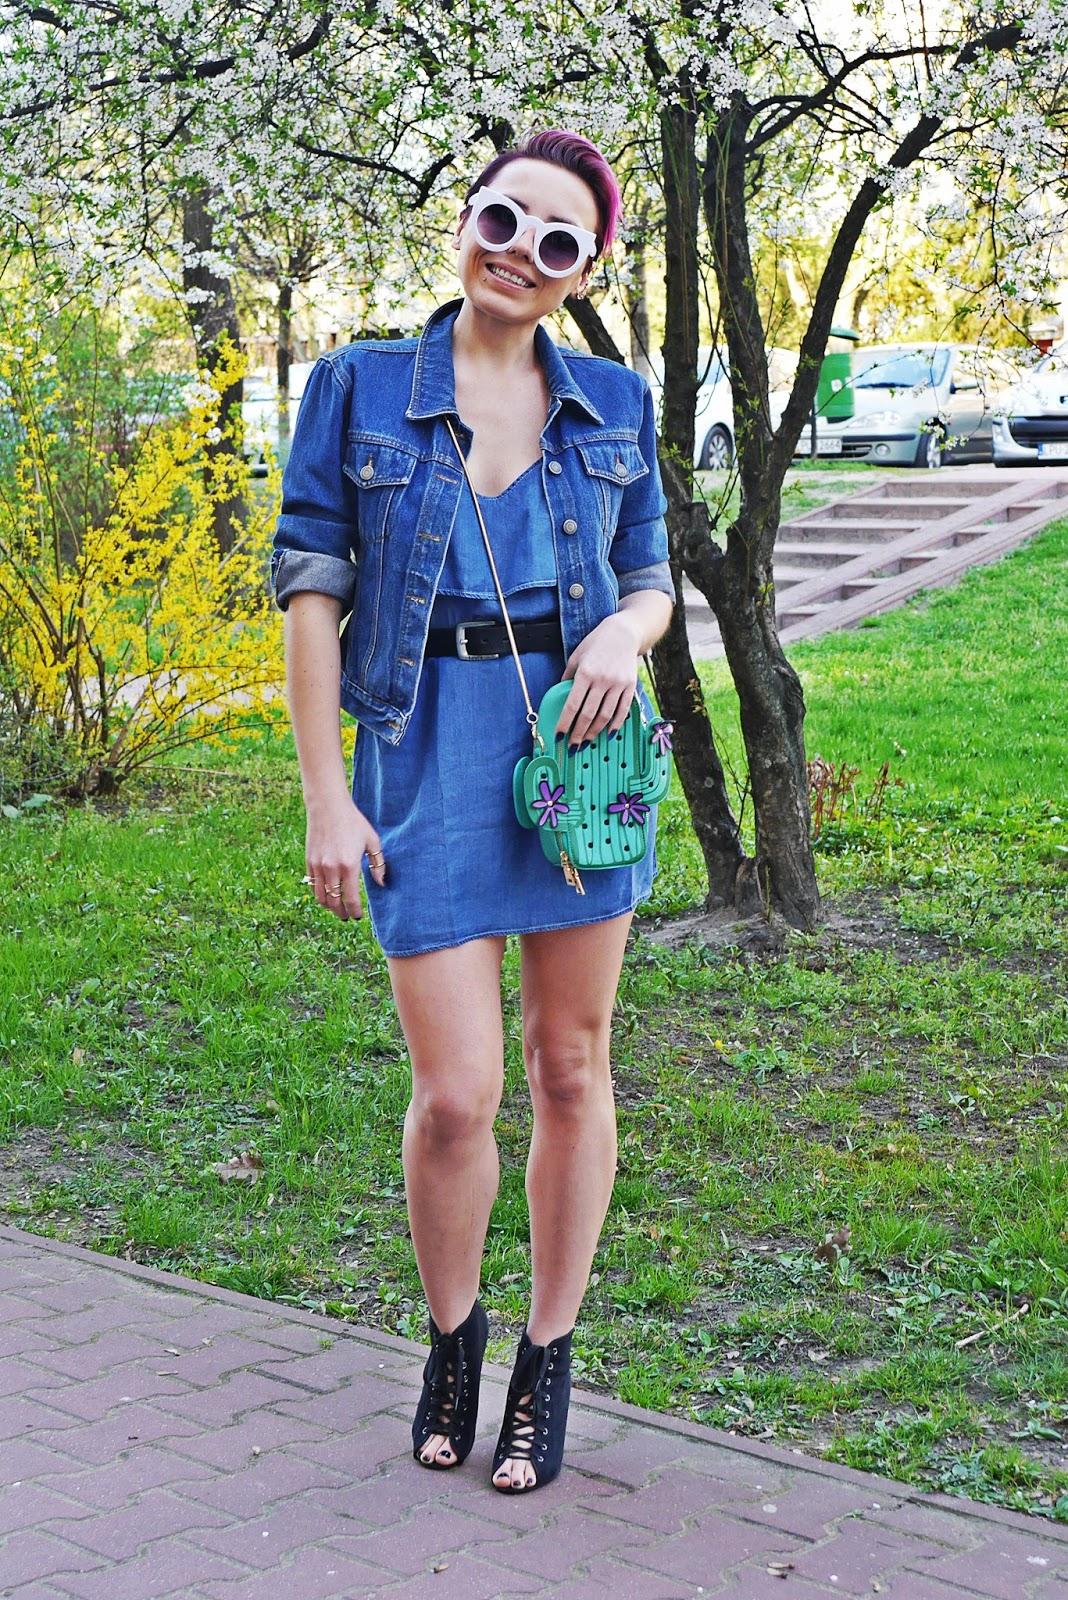 jeansowa_sukienka_torebka_kaktus_biale_okulary_koty_karyn_blog_120417a